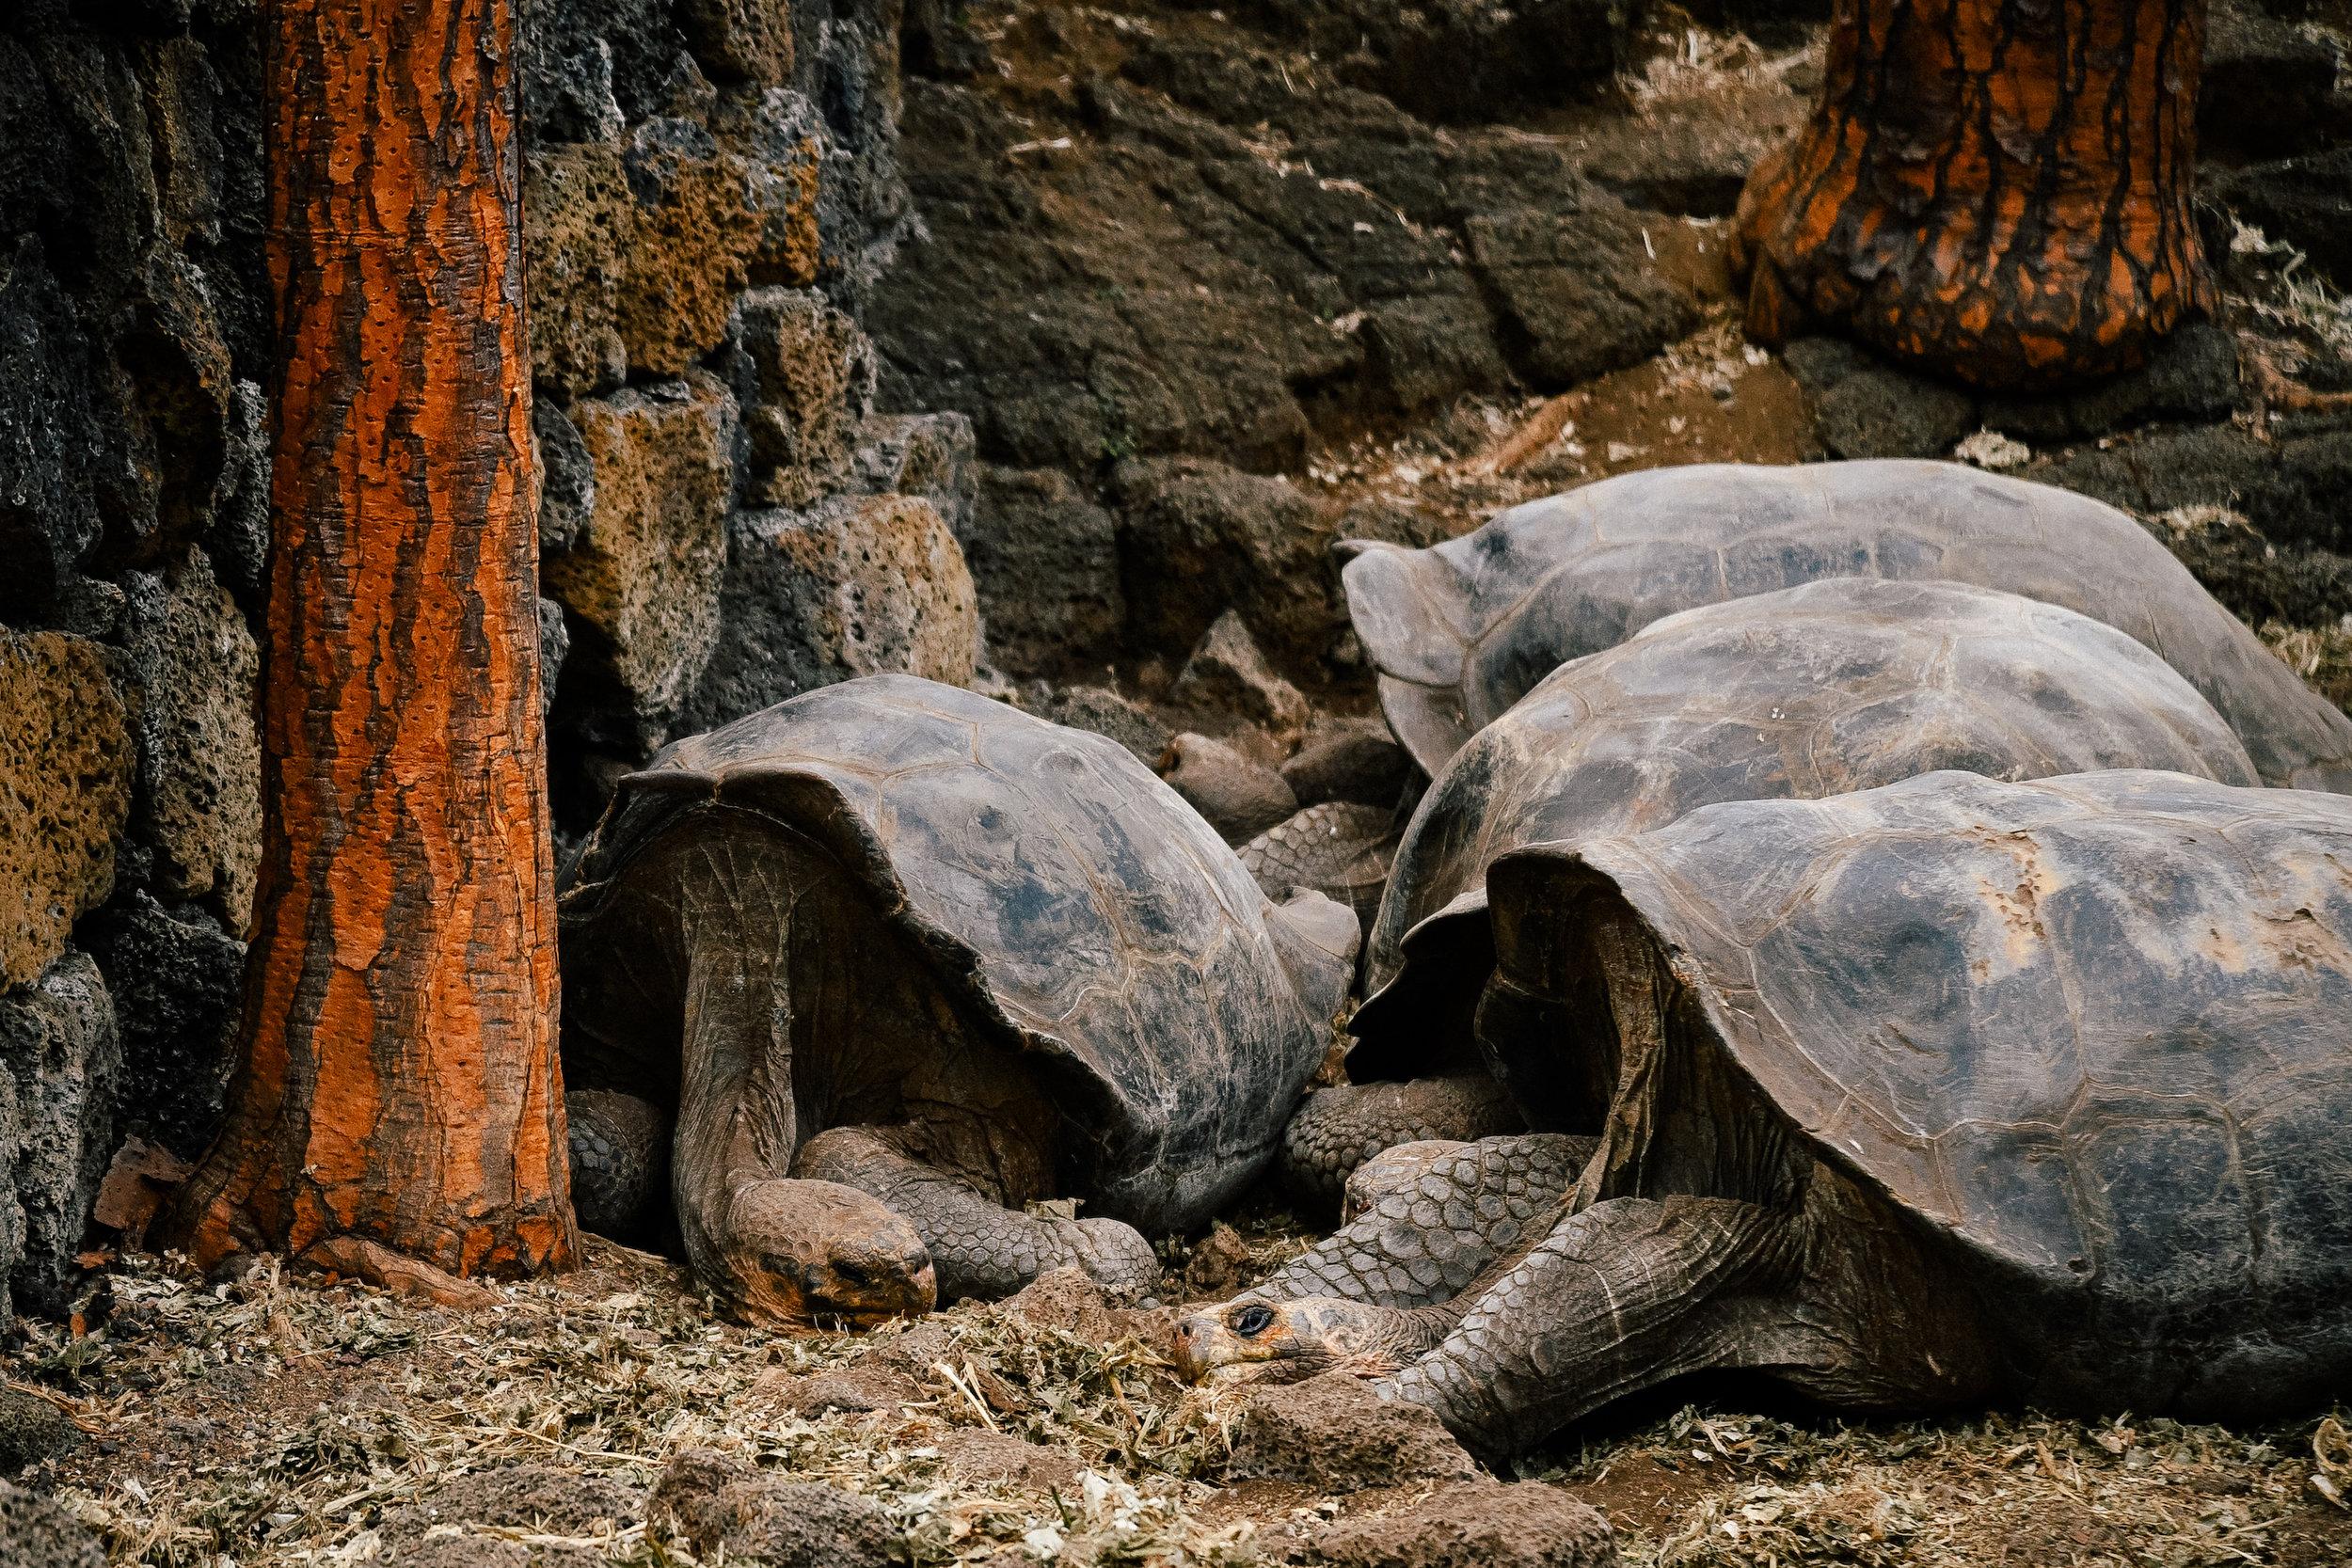 tortoises in the darwin research center, isla santa cruz, galapagos